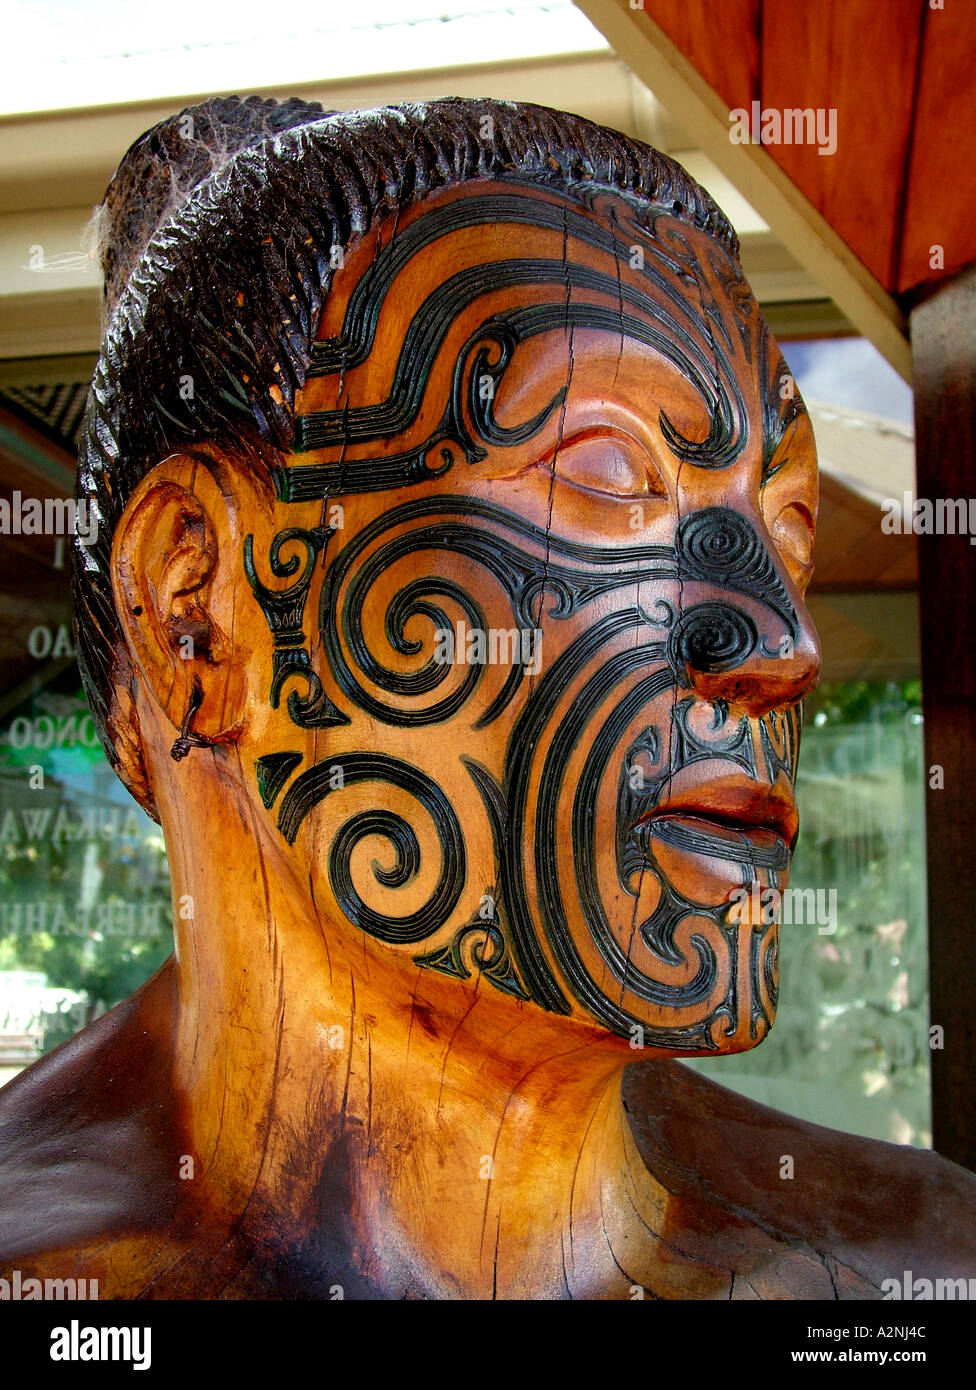 Maori Moko Tattoo Stockfotos  Maori Moko Tattoo Bilder